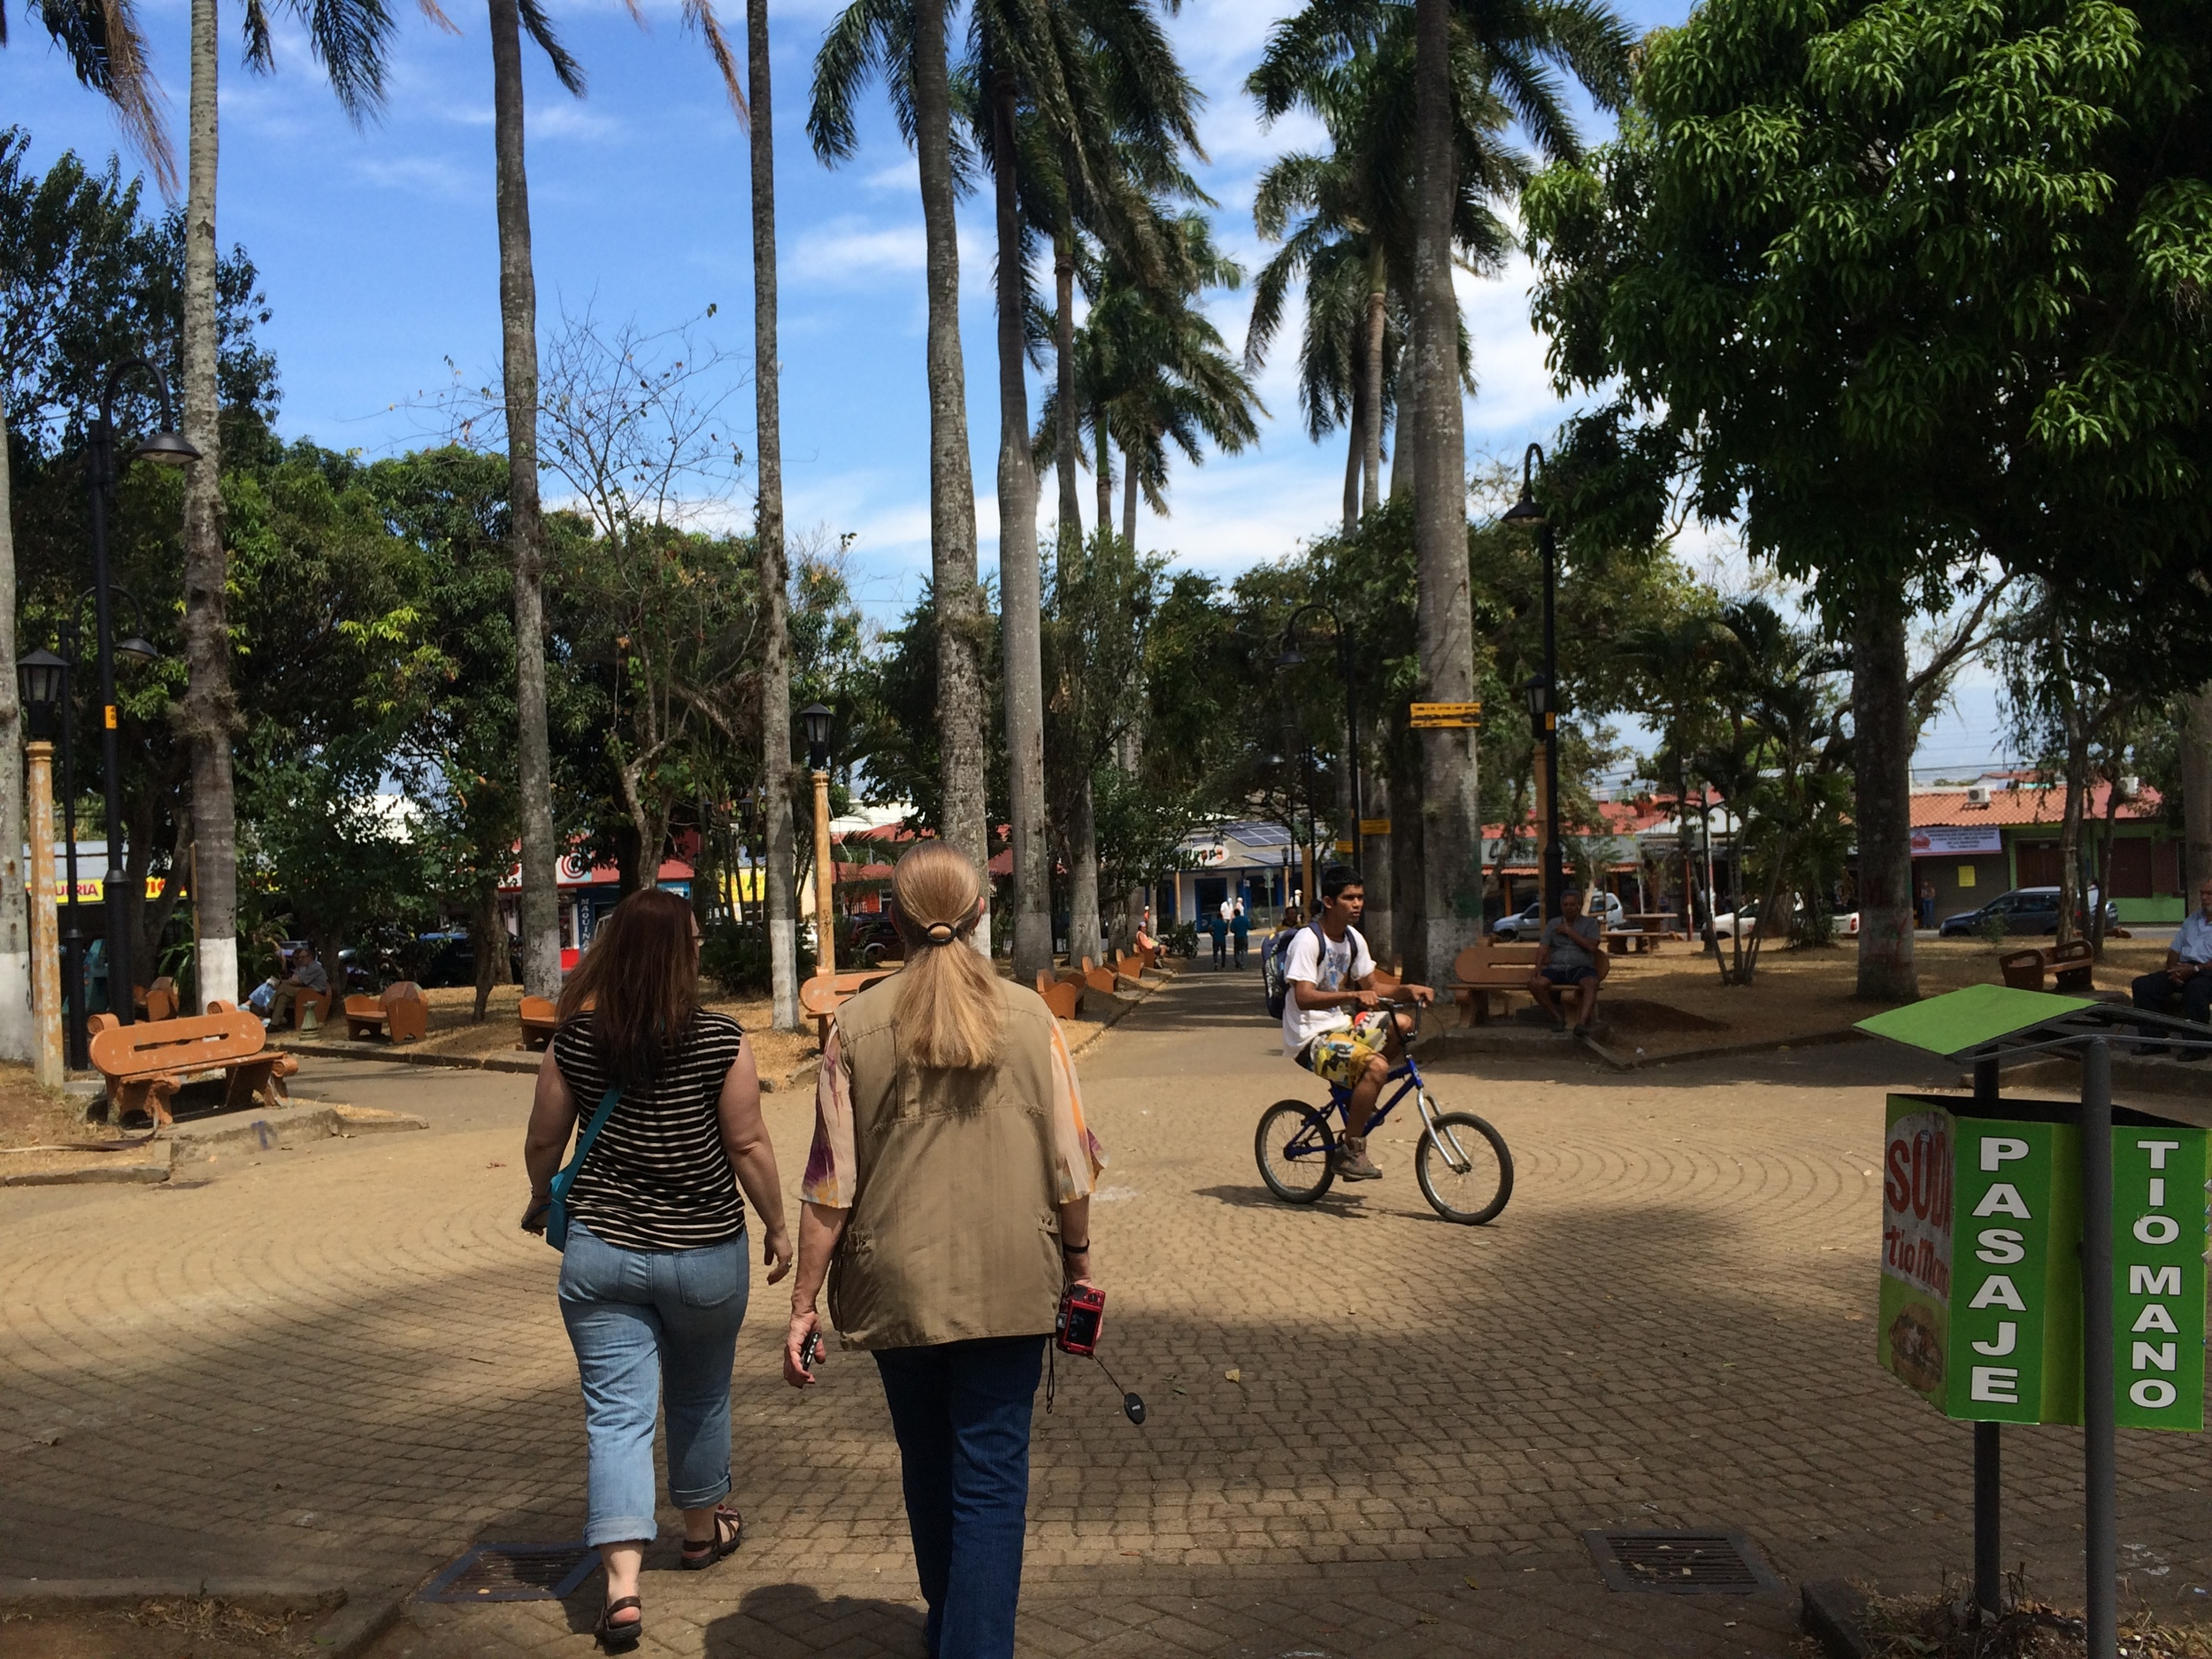 Katrina and Cheri stroll through the central plaza